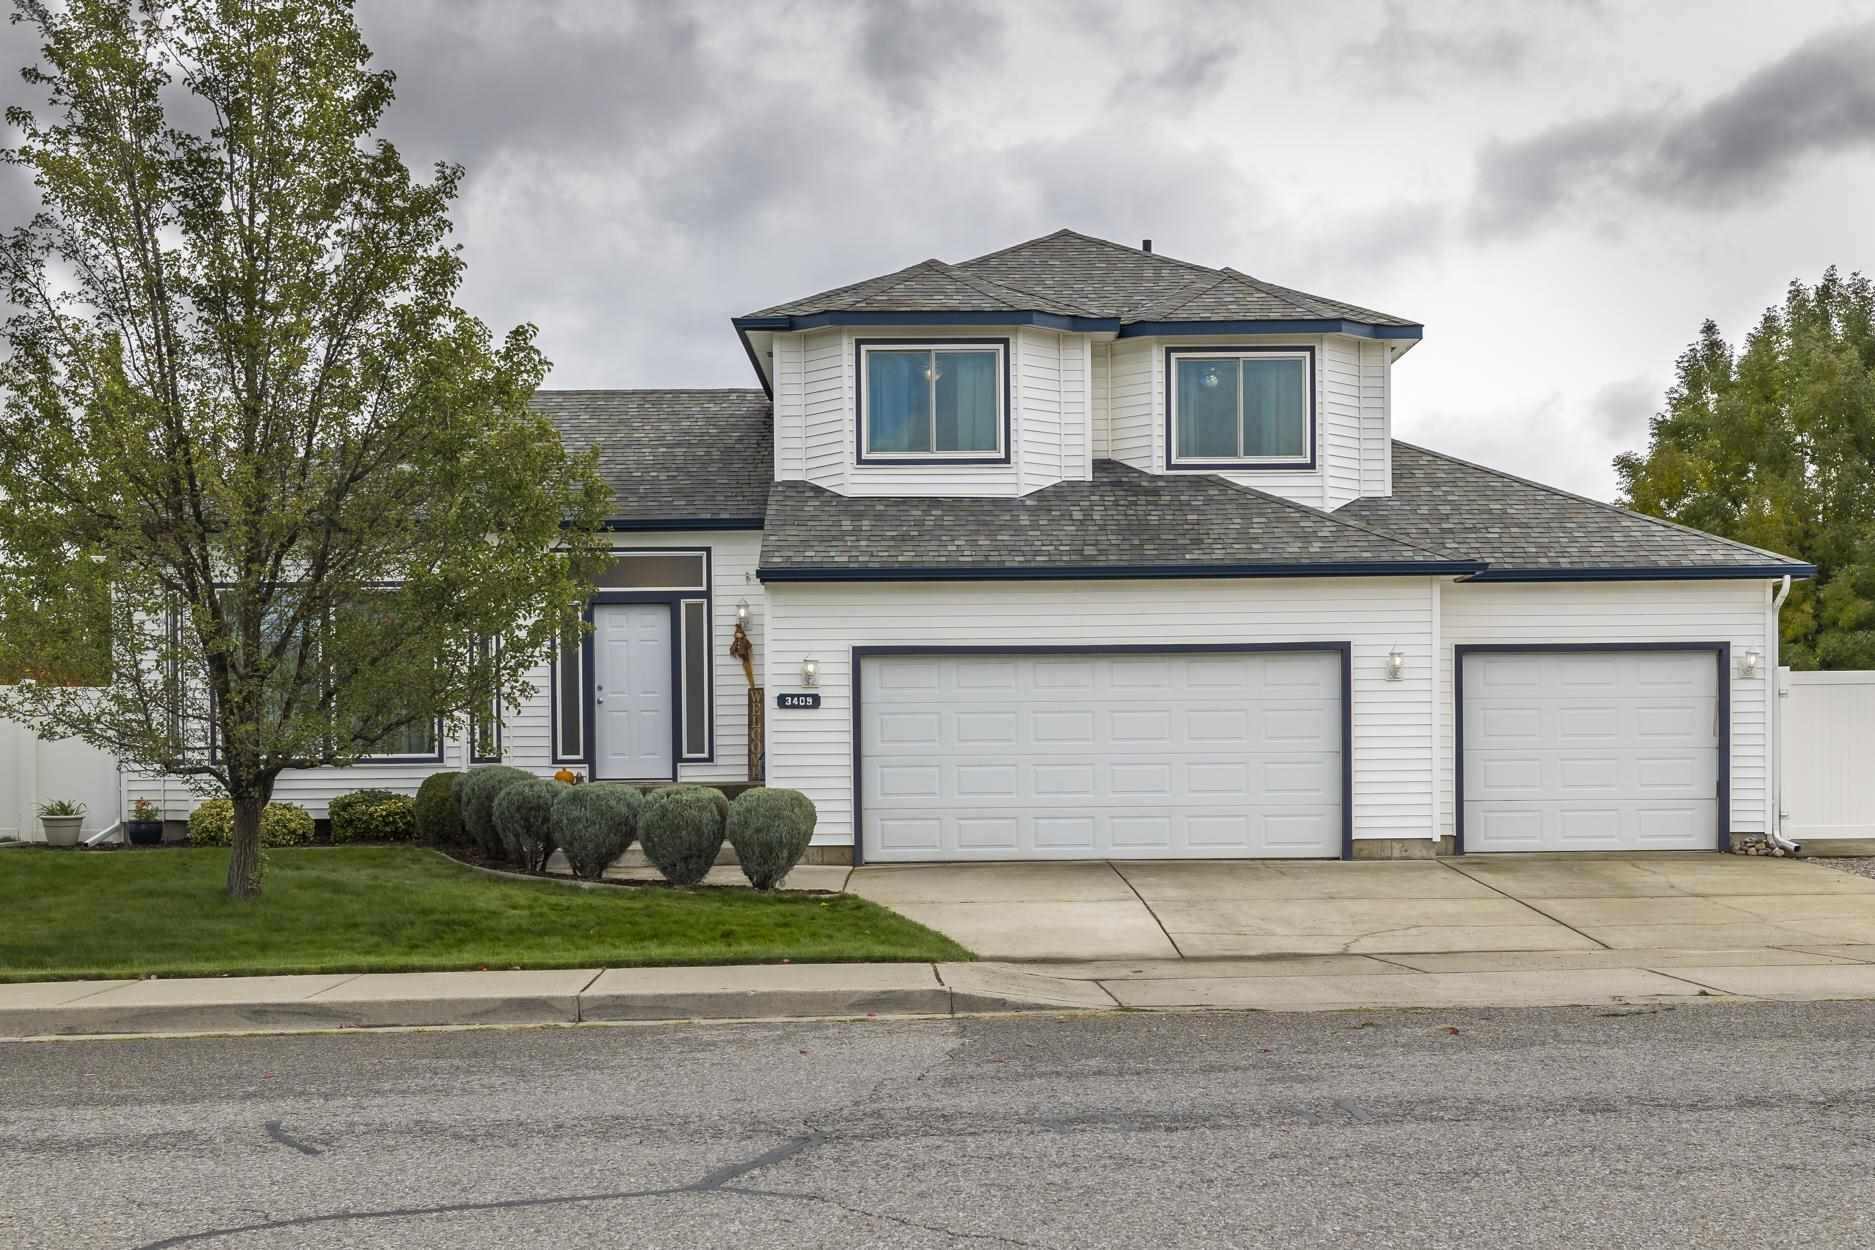 3409 S Woodlawn Dr, Spokane Valley, WA 99206 - #: 202123198